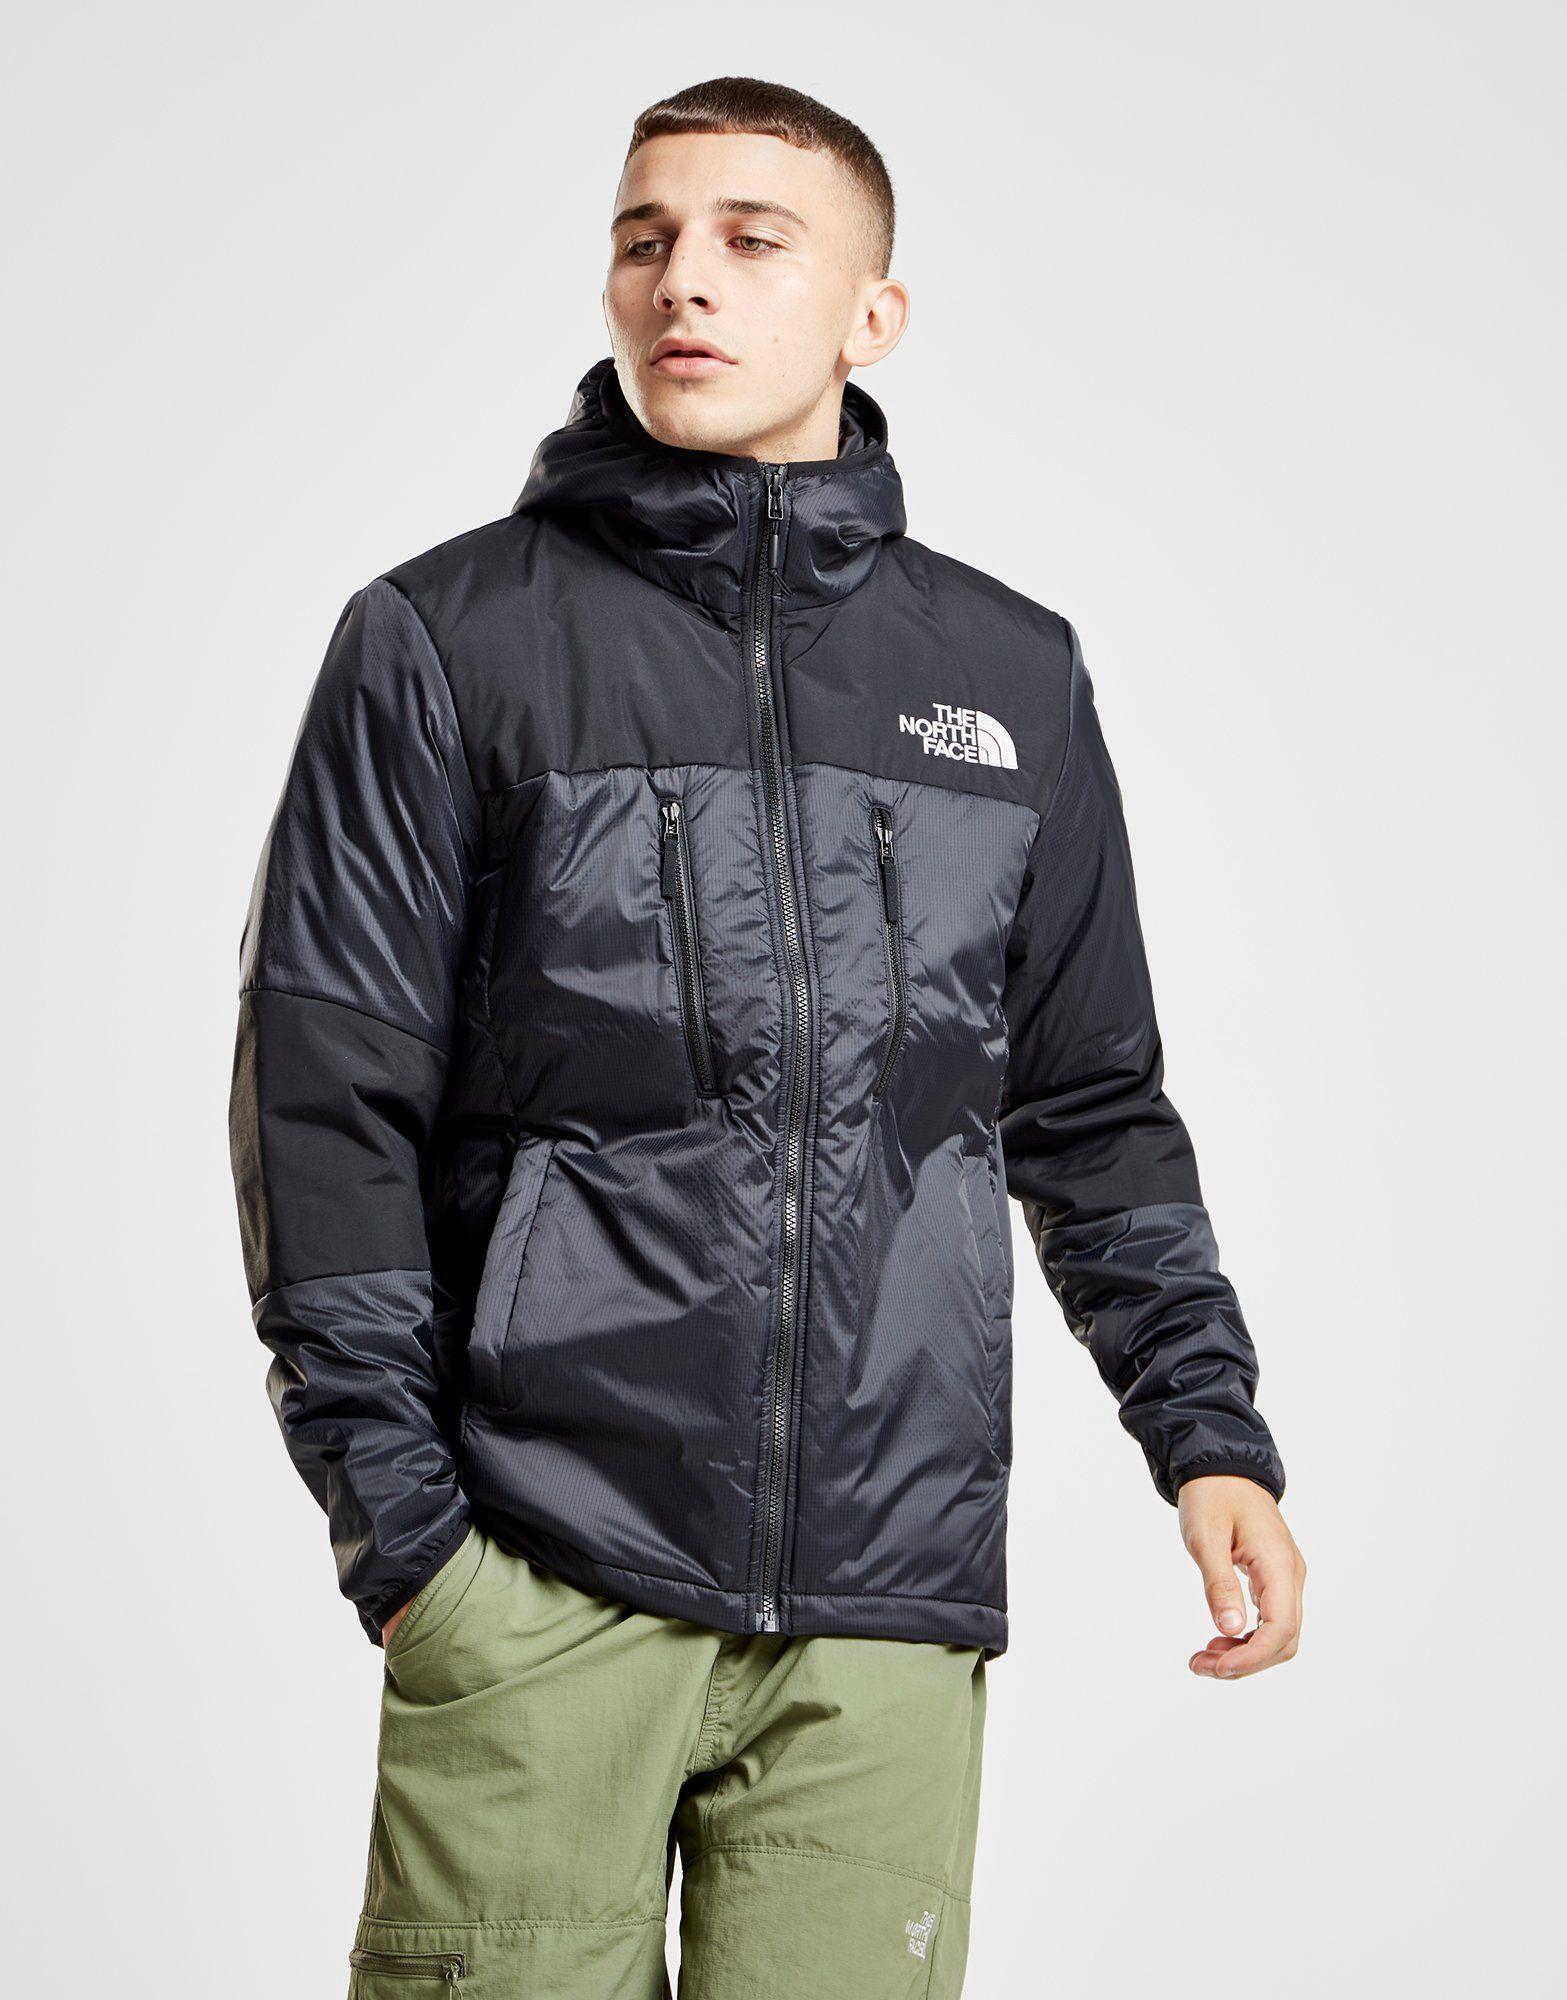 The North Face Himalayan Jacket